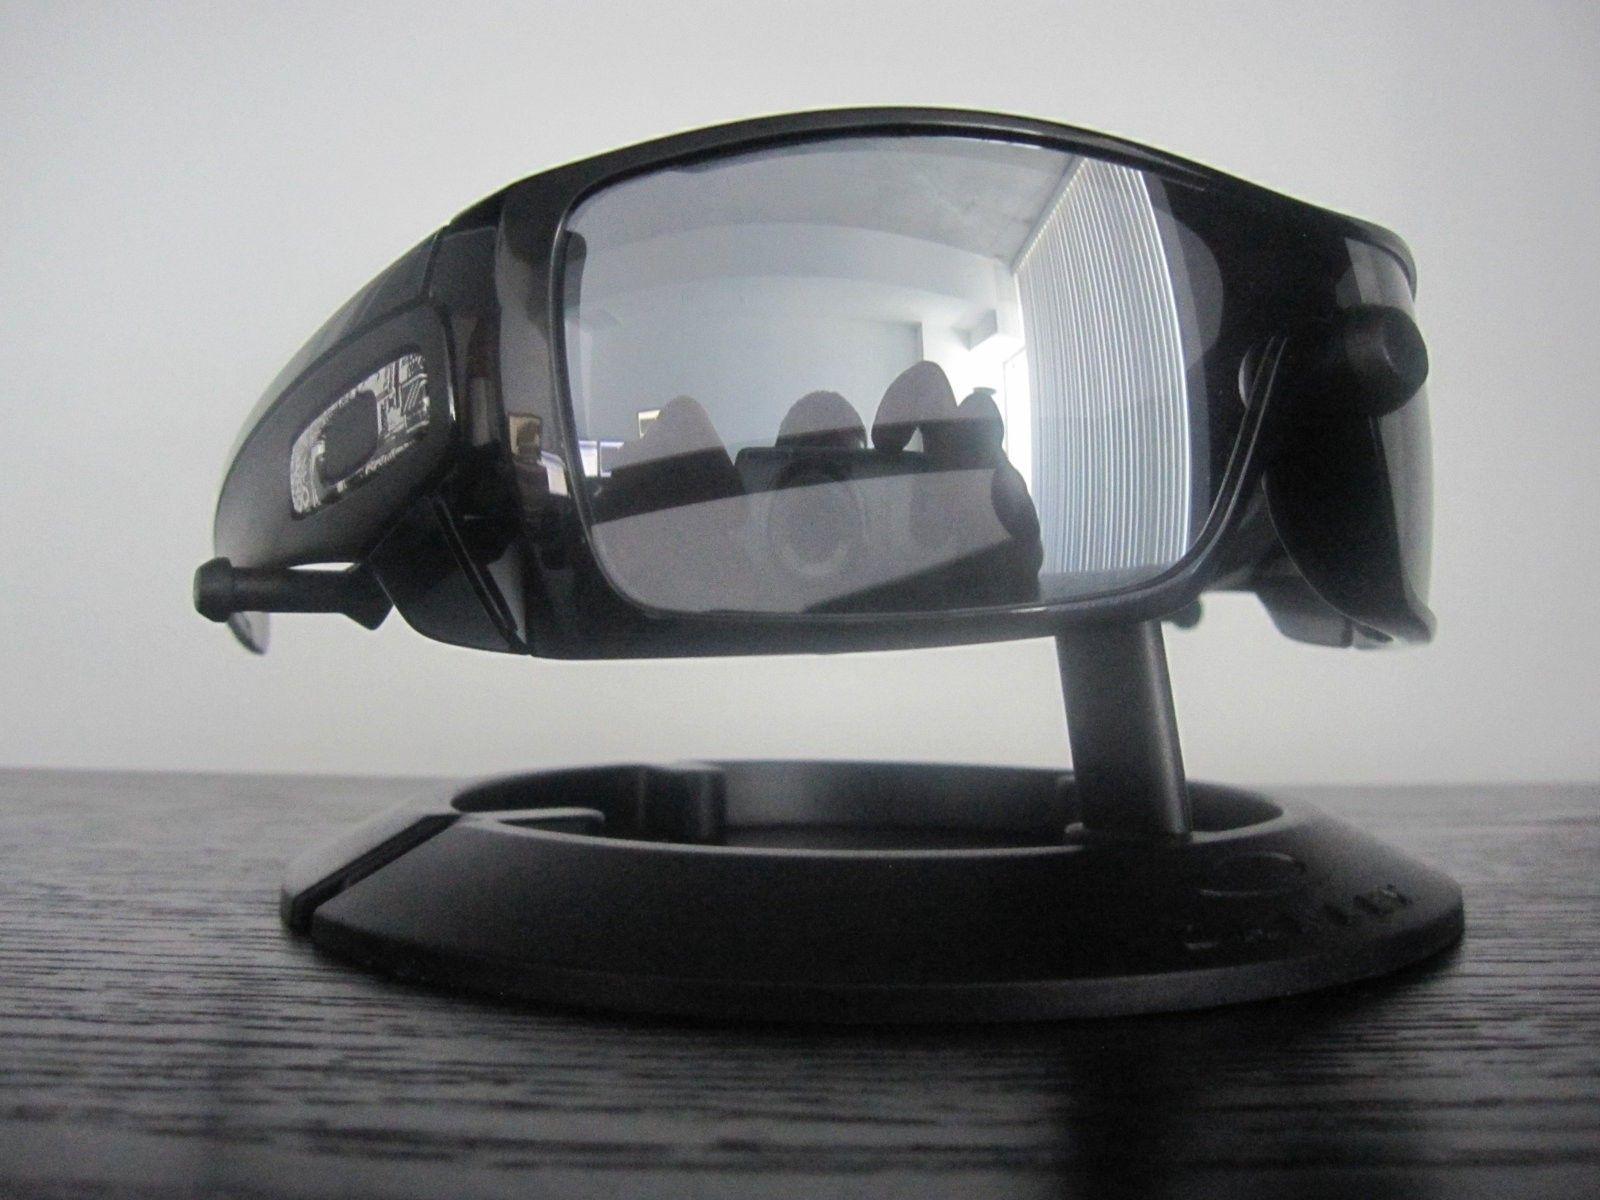 BNIB BATWOLF SKU # 9101-01 - Black Ink / Black Iridium - GONE - IMG_5055.JPG